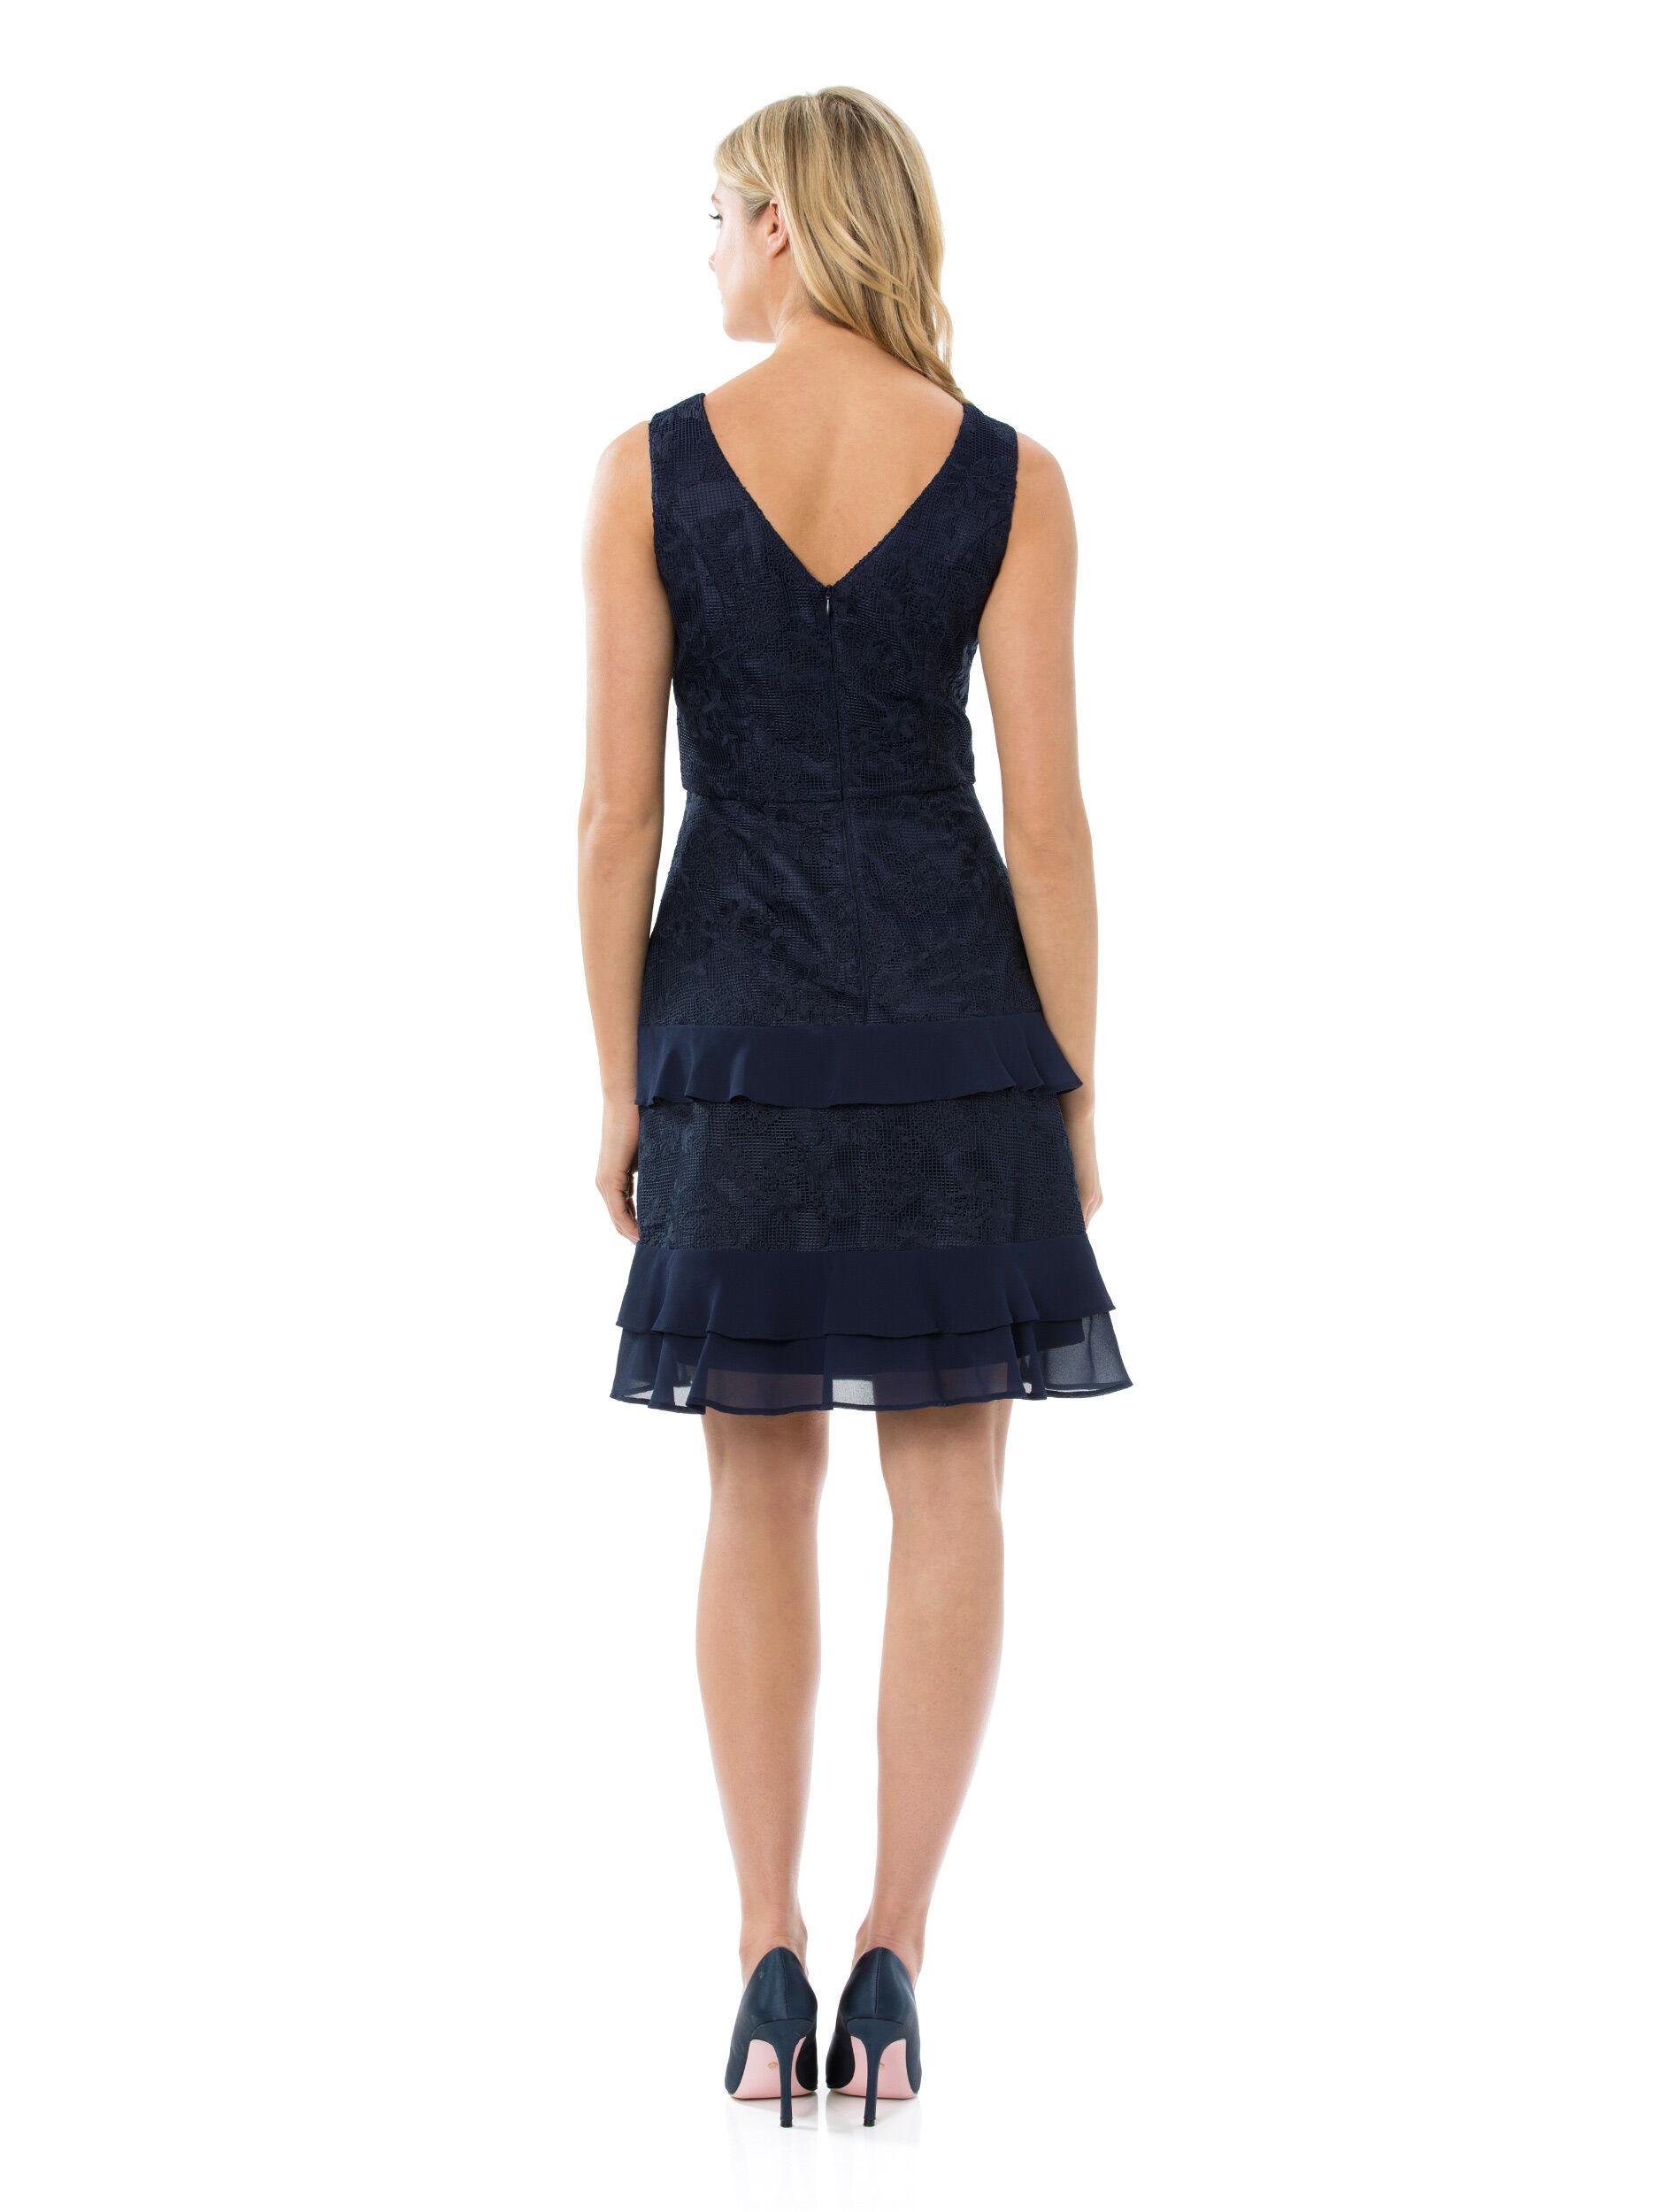 La Di Dah Dress